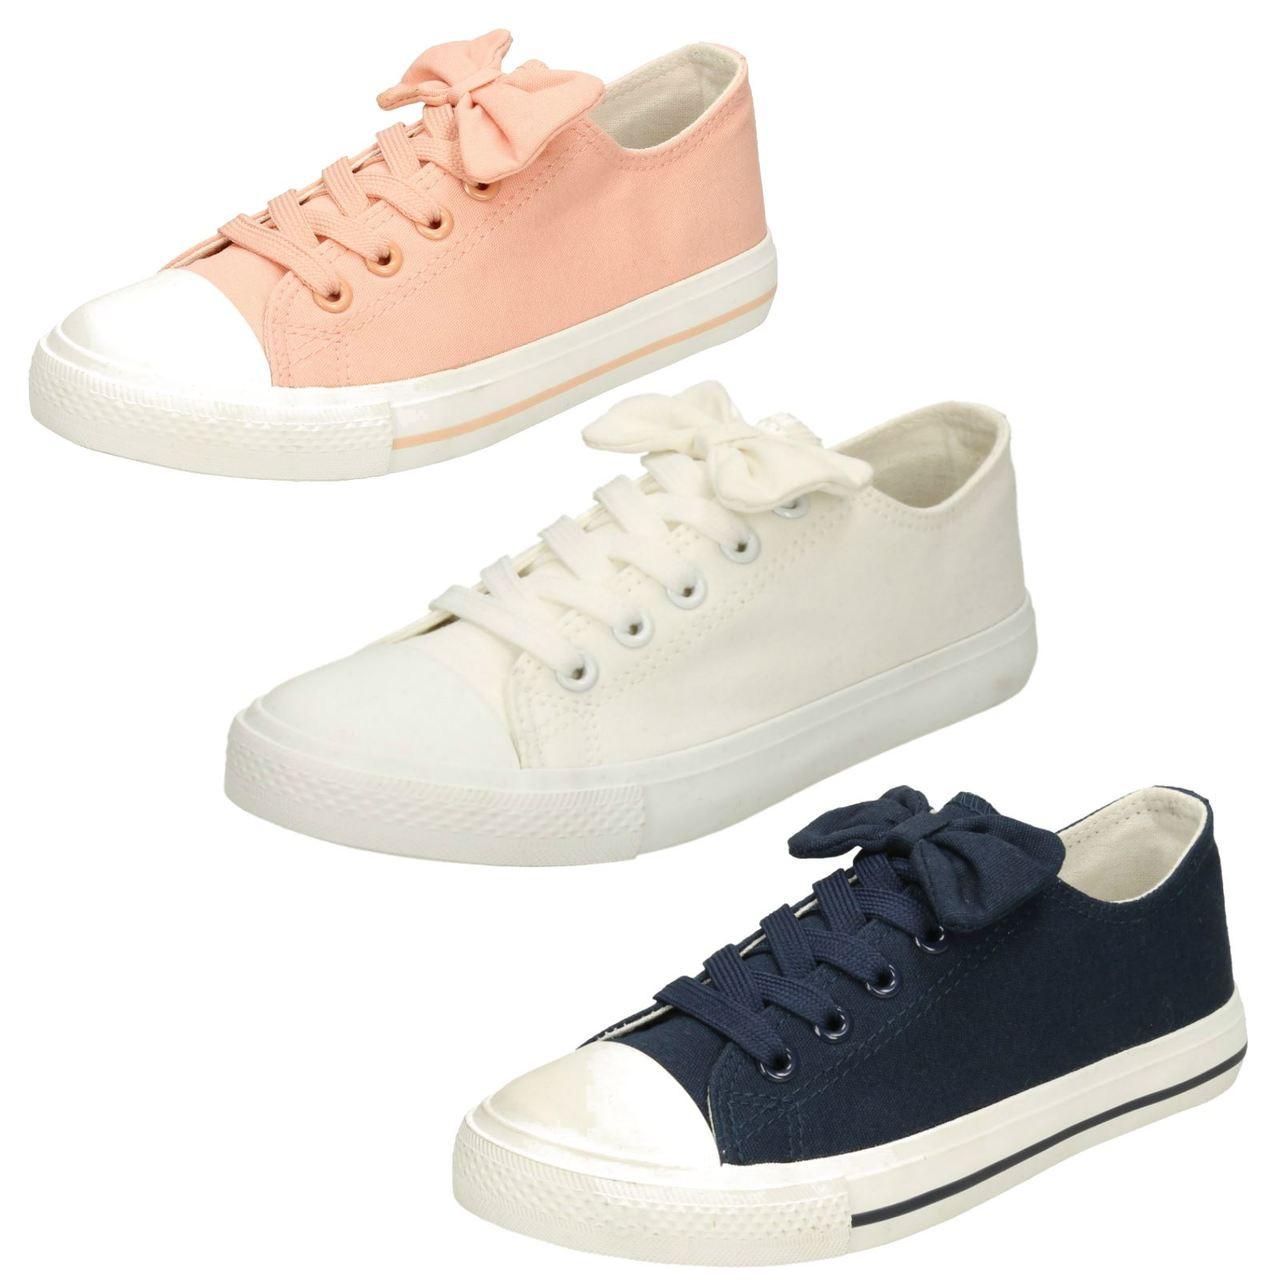 Ladies Spot On Lace Up Canvas Shoes